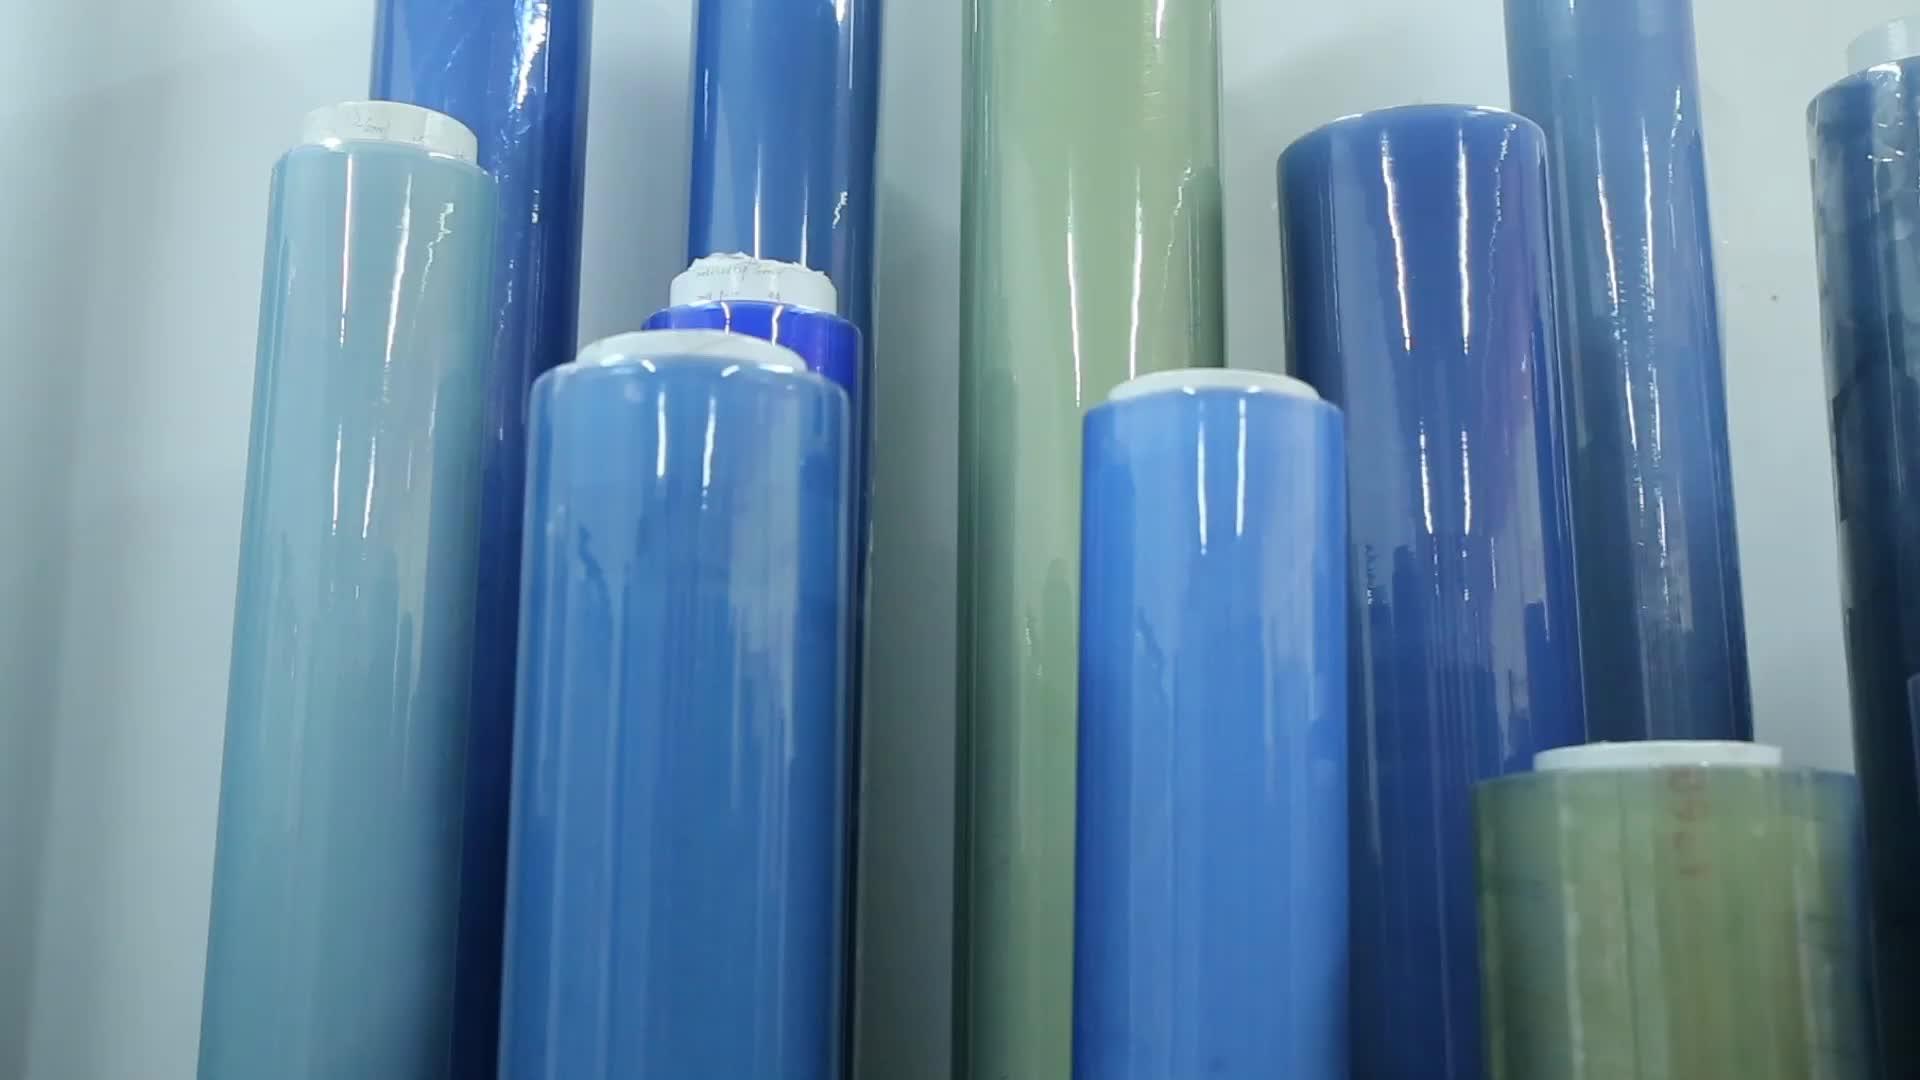 Guangzhou Chian weiche PVC-Rolle super klare normale transparente Kunststofffolie